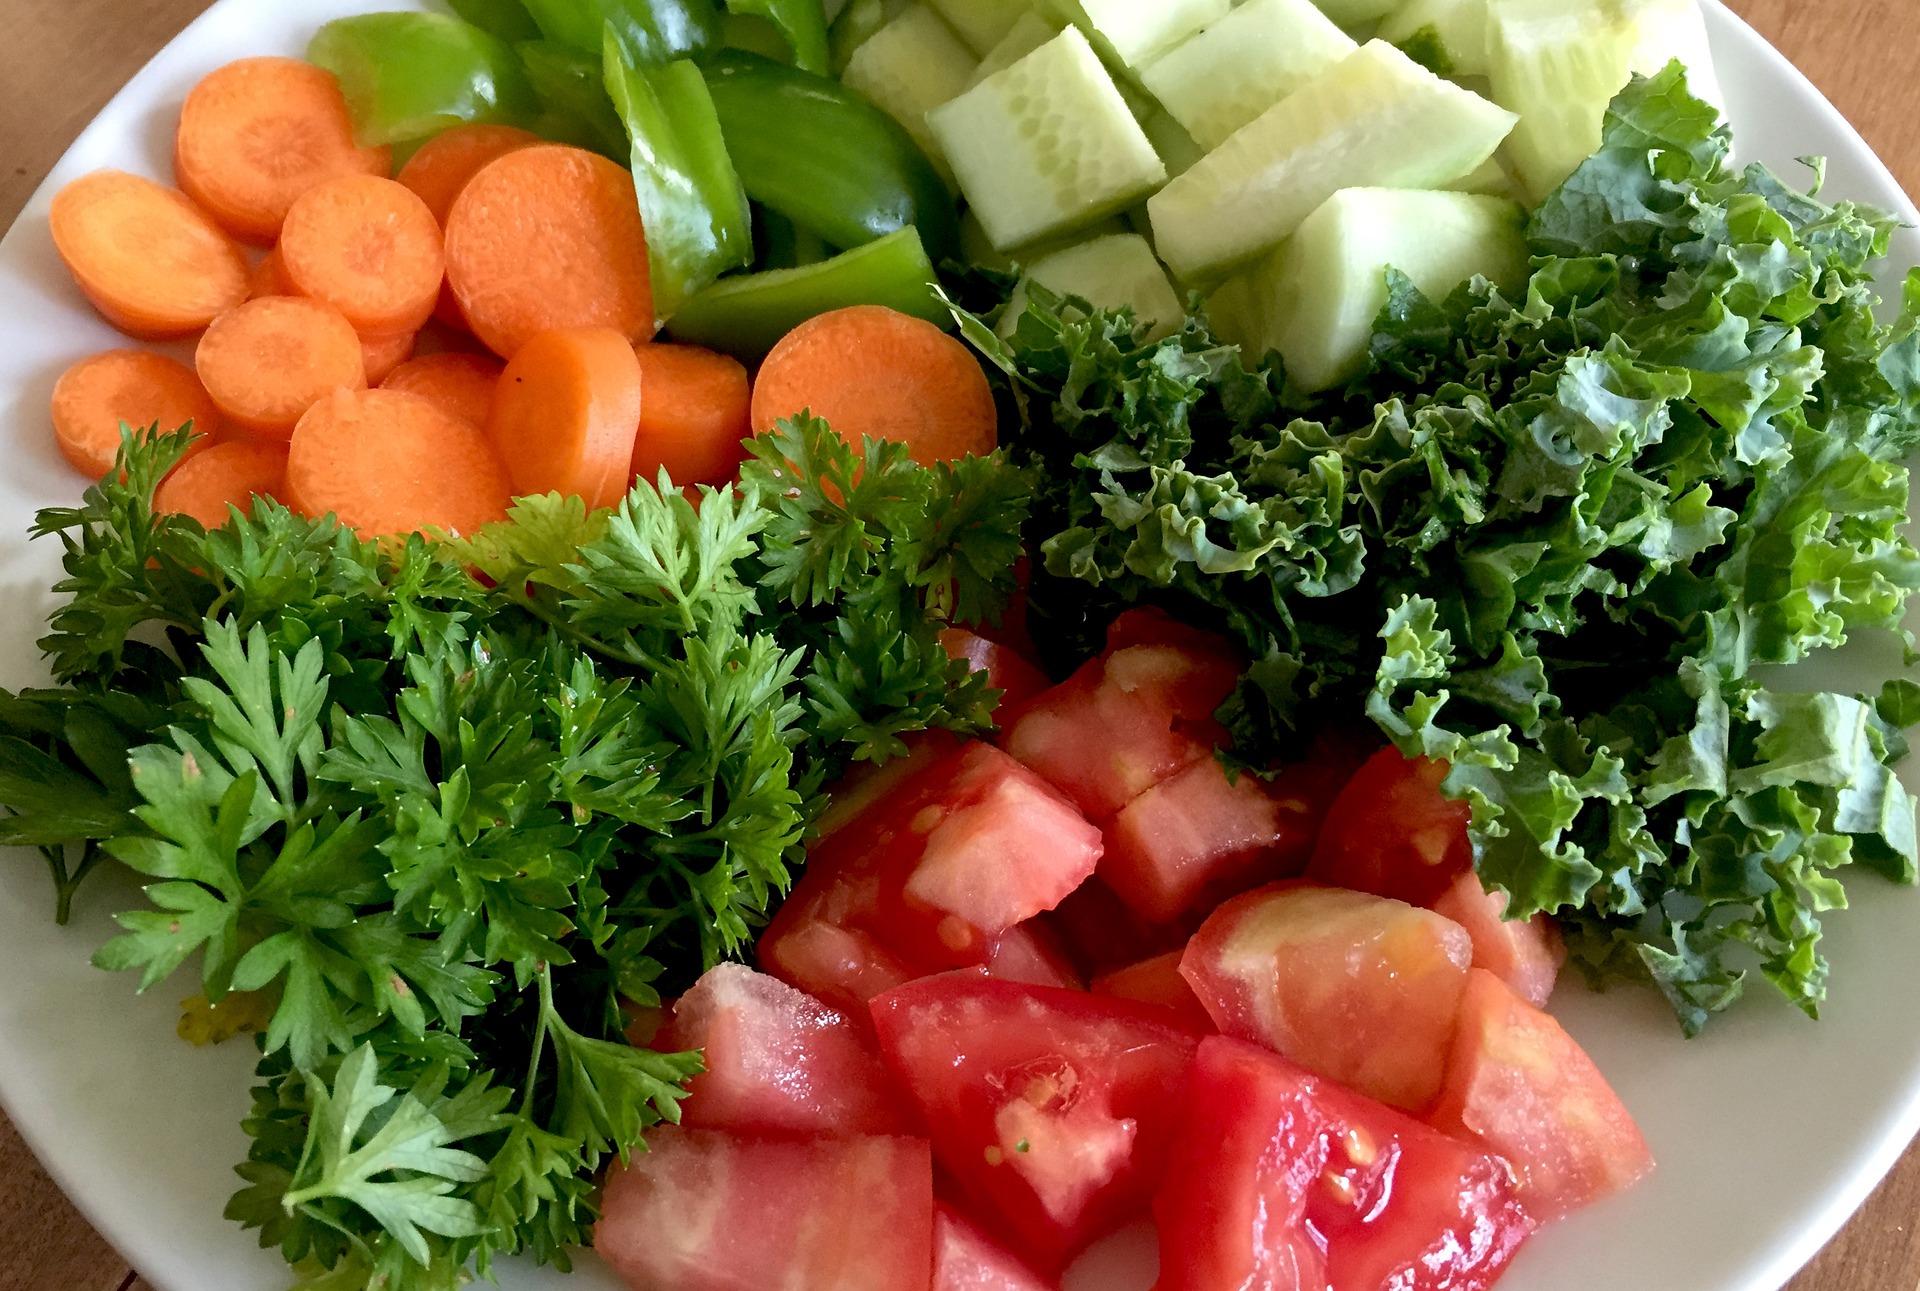 vegetables-4464012_1920.jpg